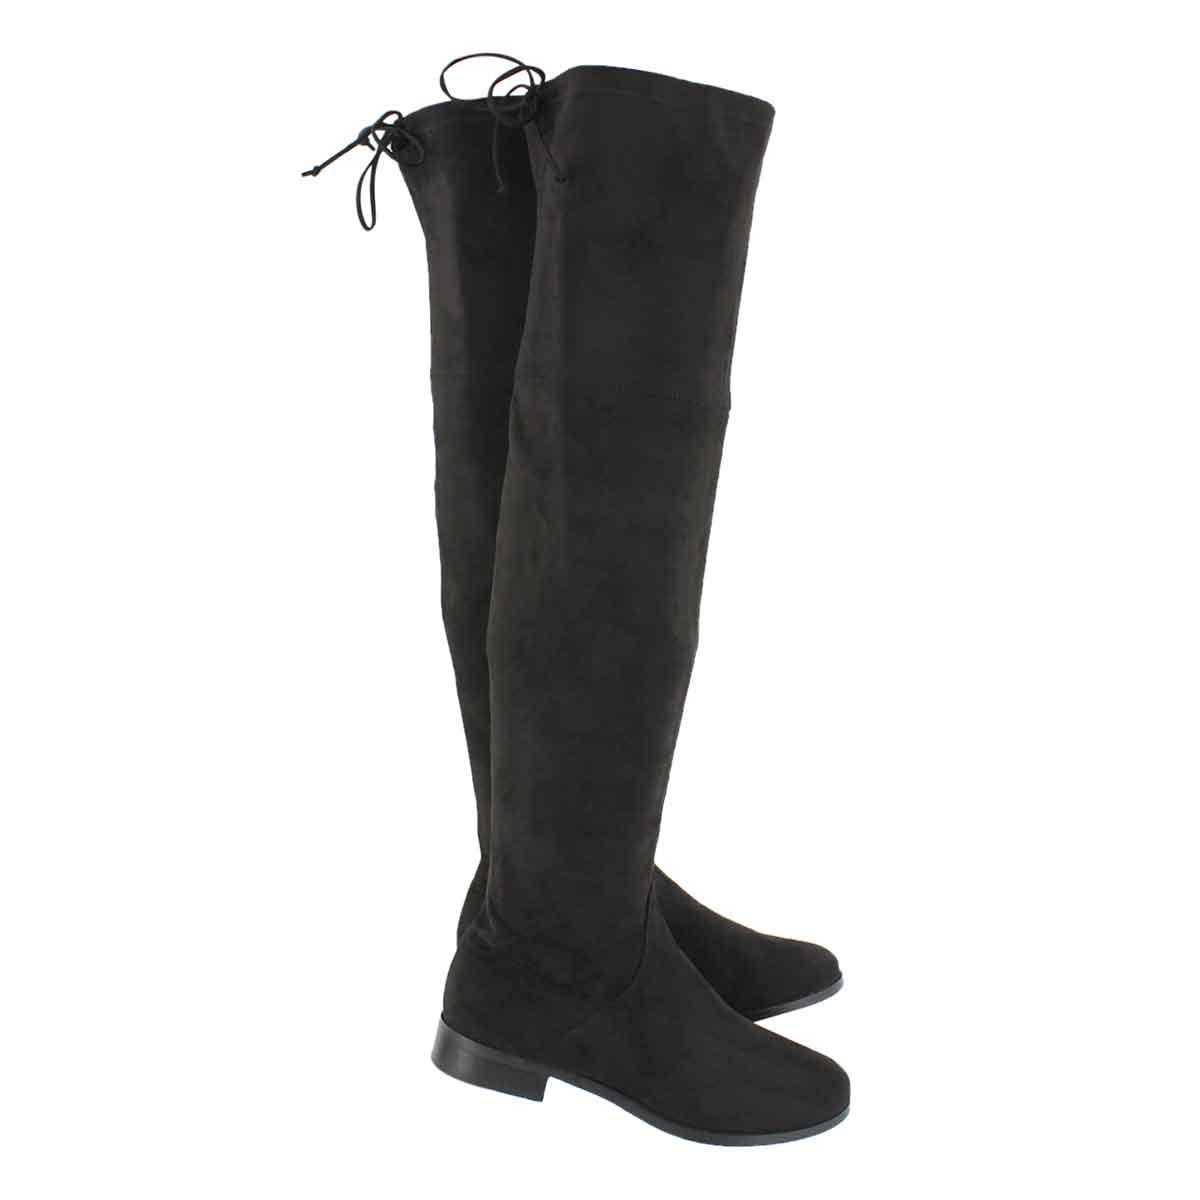 Lds Didi black knee high boot